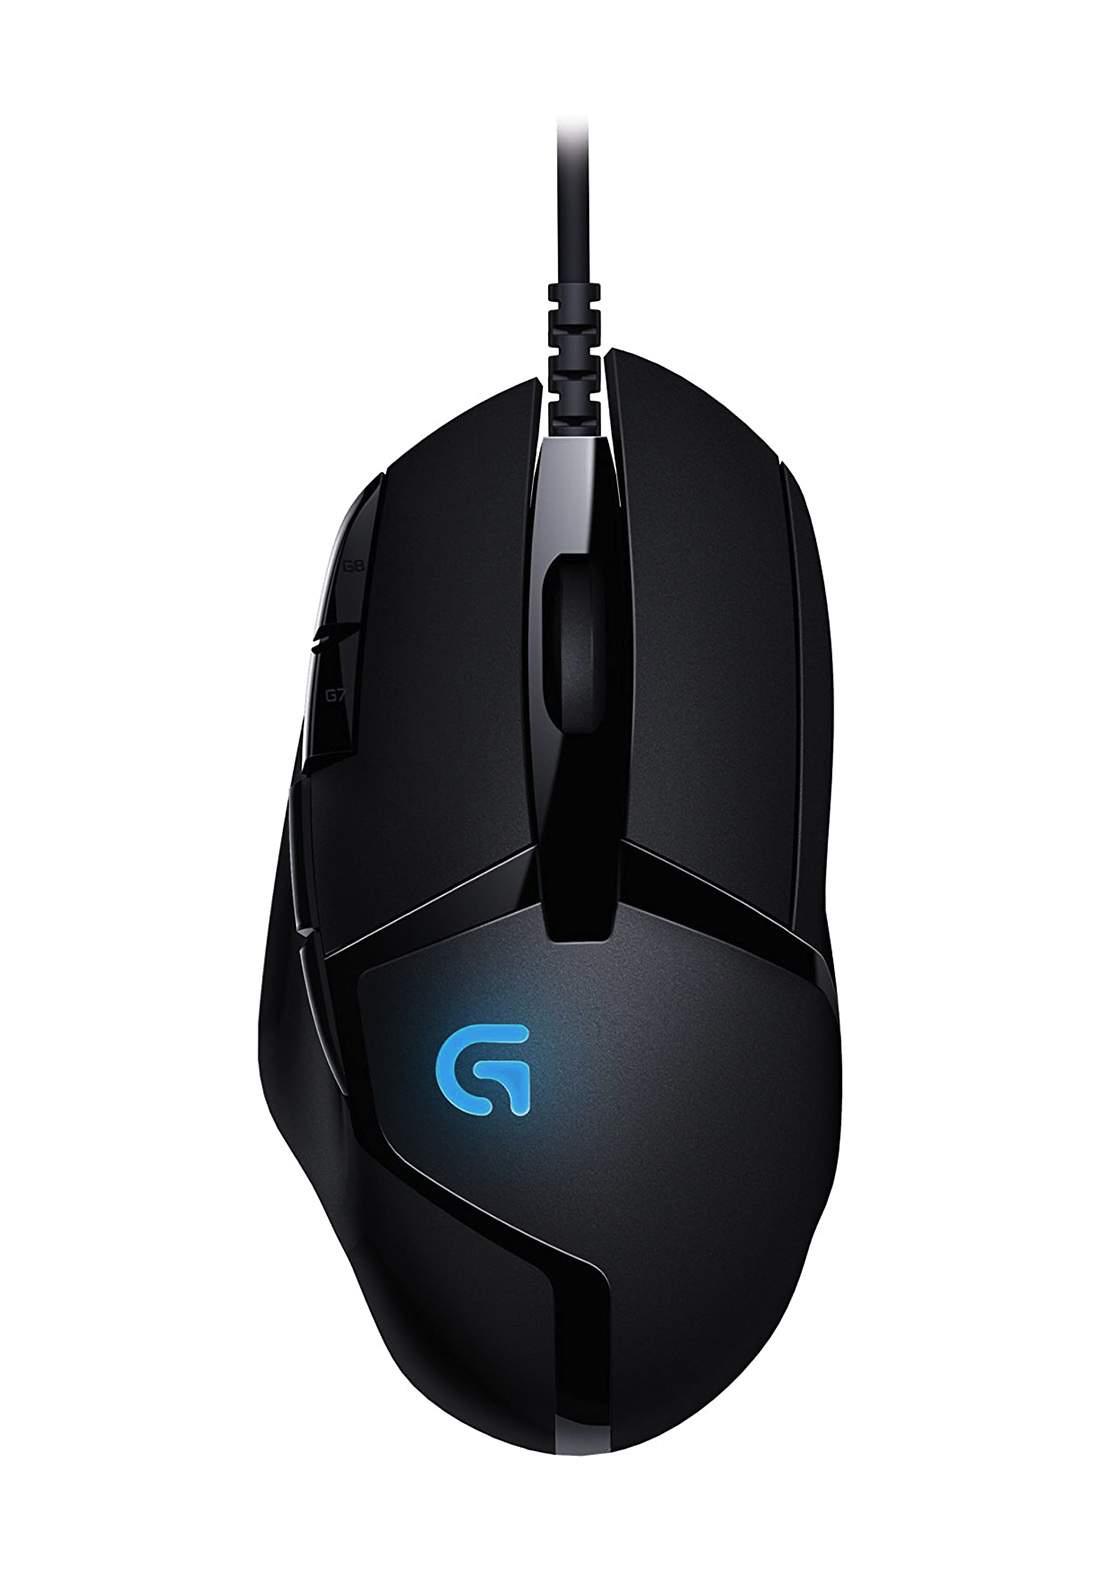 Logitech G402 Gaming Mouse - Black ماوس